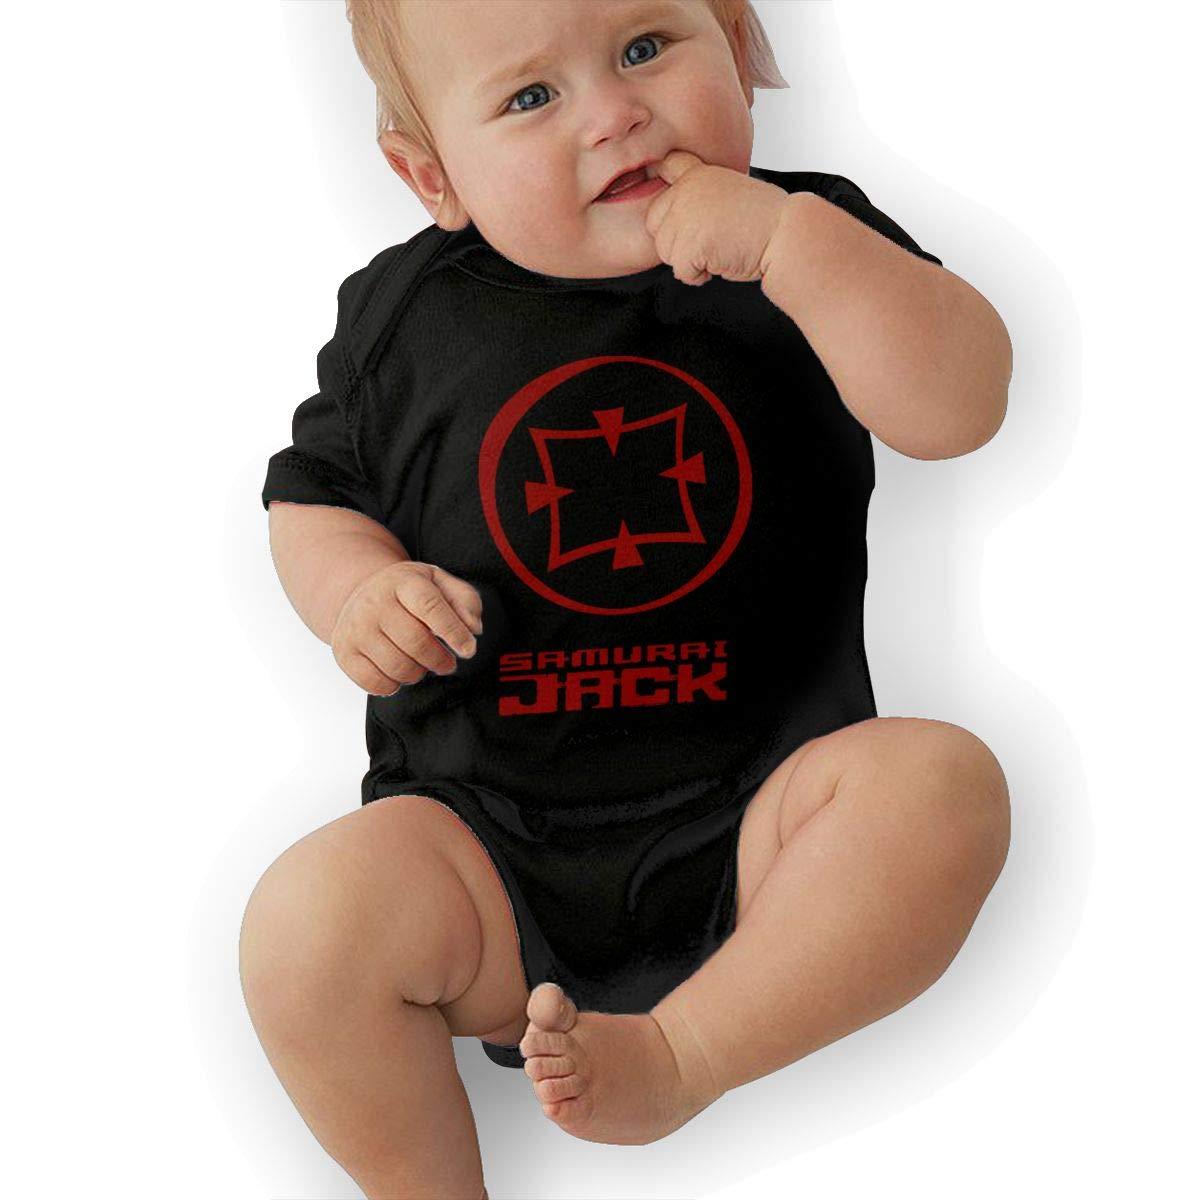 LANBRELLA Little Girls/&Boys Unisex Samurai Jack Cotton Crew Neck Short Sleeves Tee Top